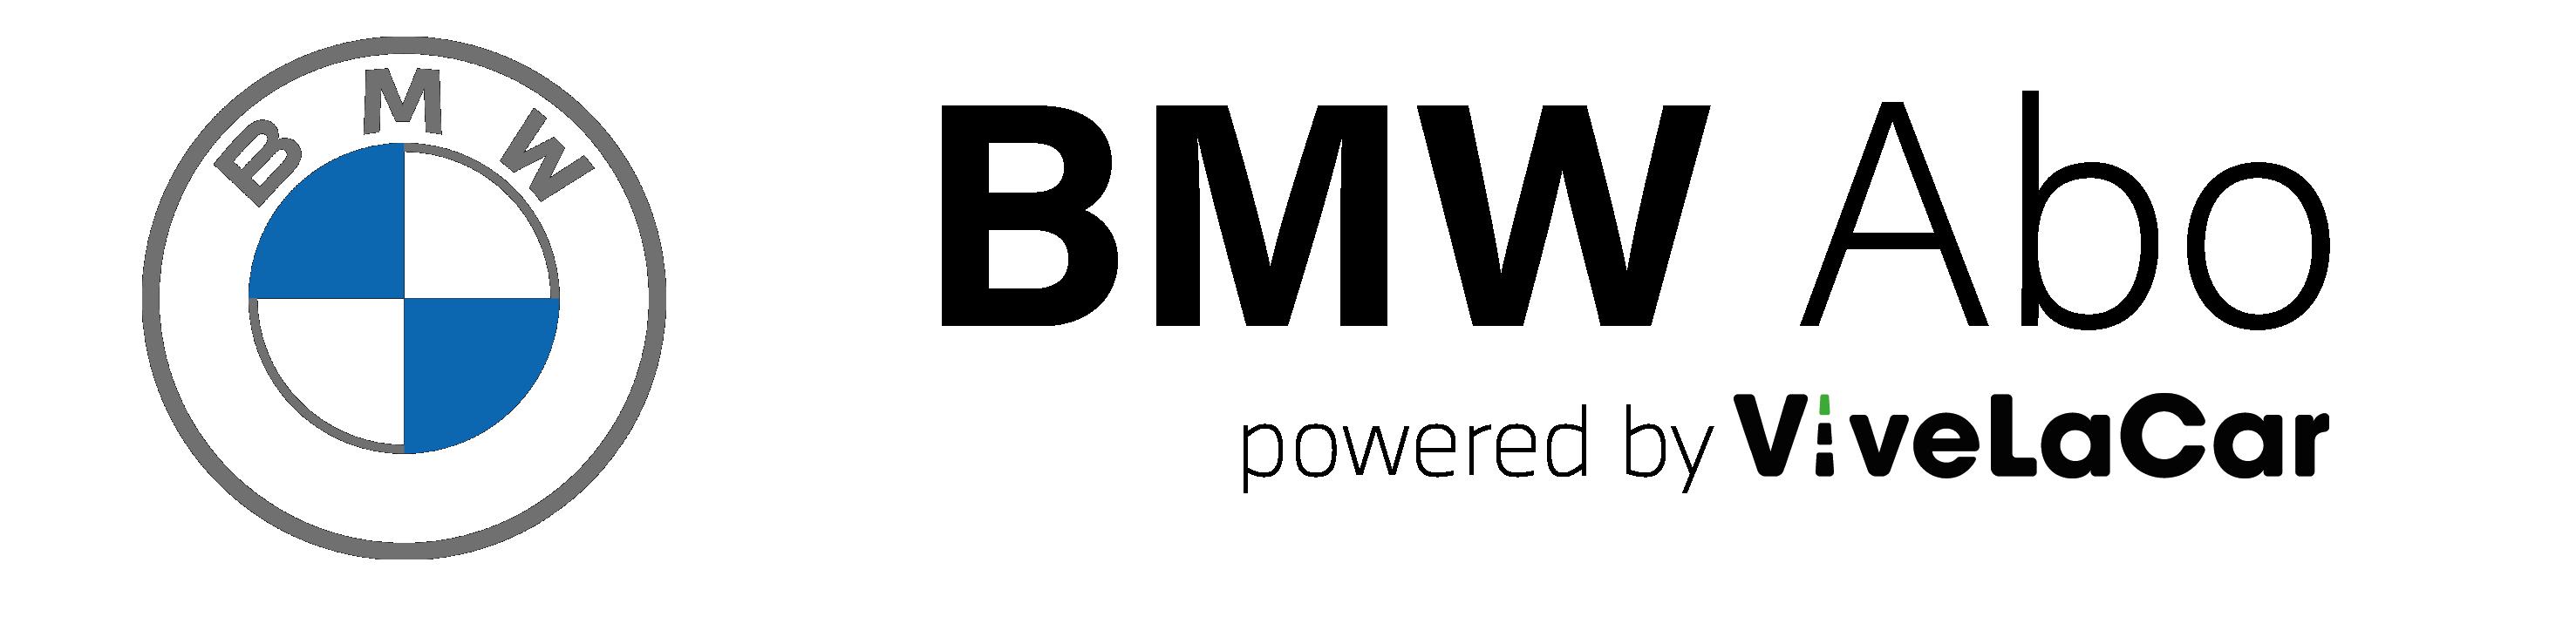 bmw-abo.ch